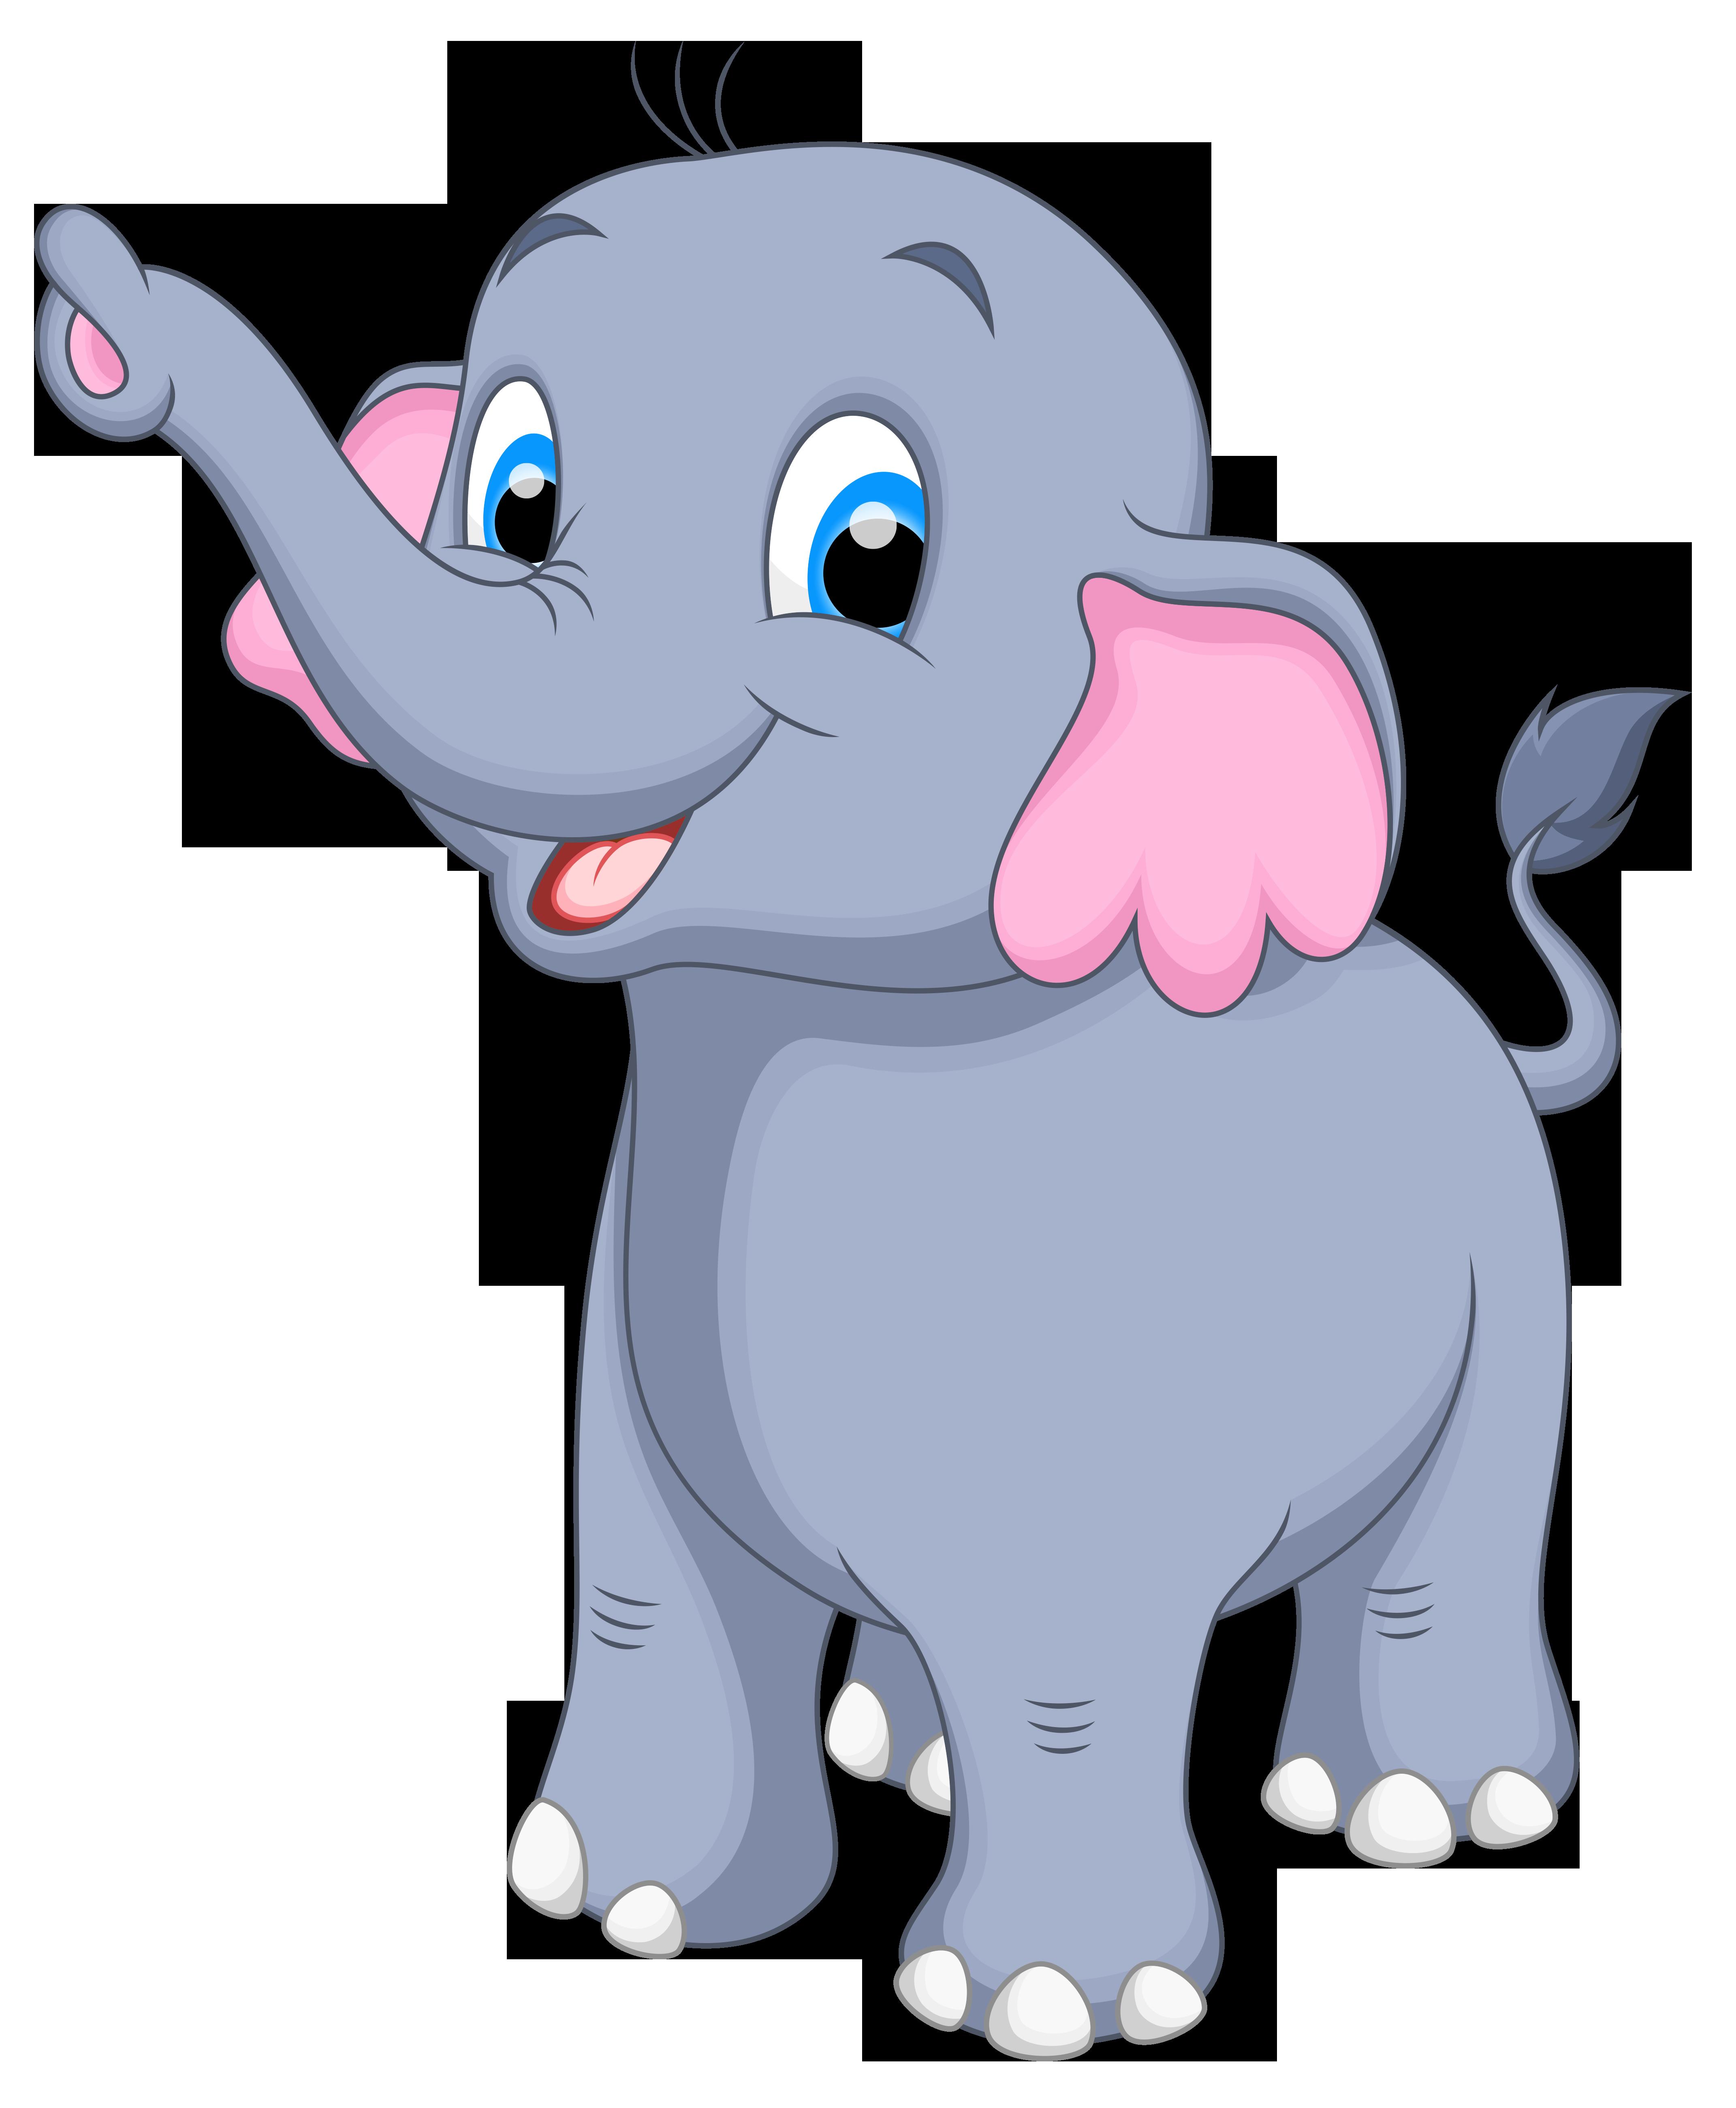 Transparent Background Elephant Clipart Png Cute Elephant Cartoon Elephant Clip Art Cartoon Elephant